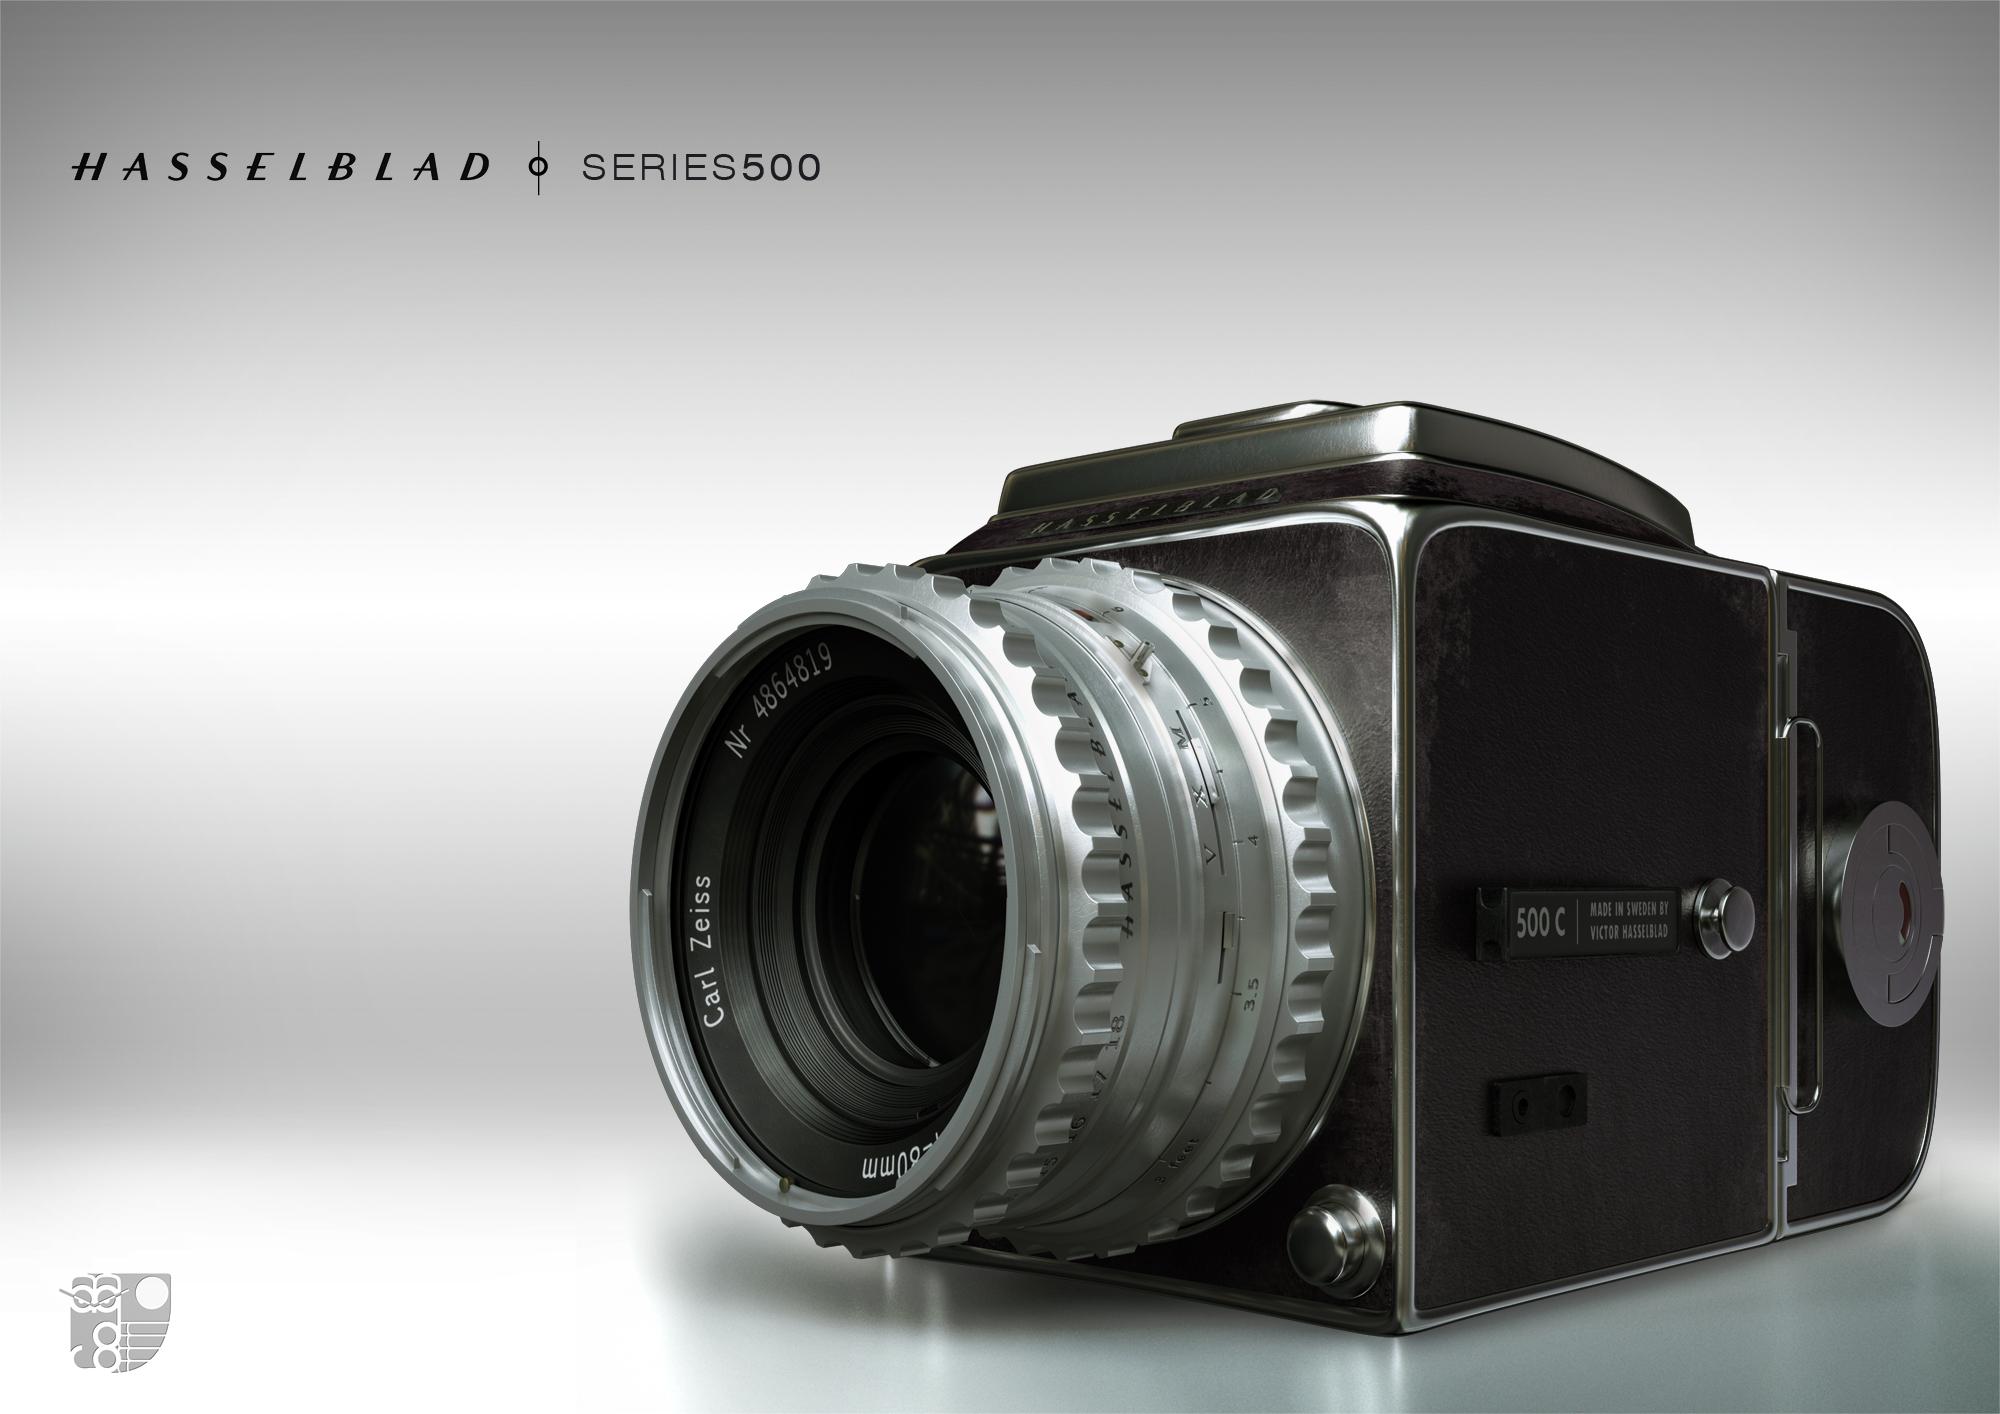 cam0335mm04.jpg